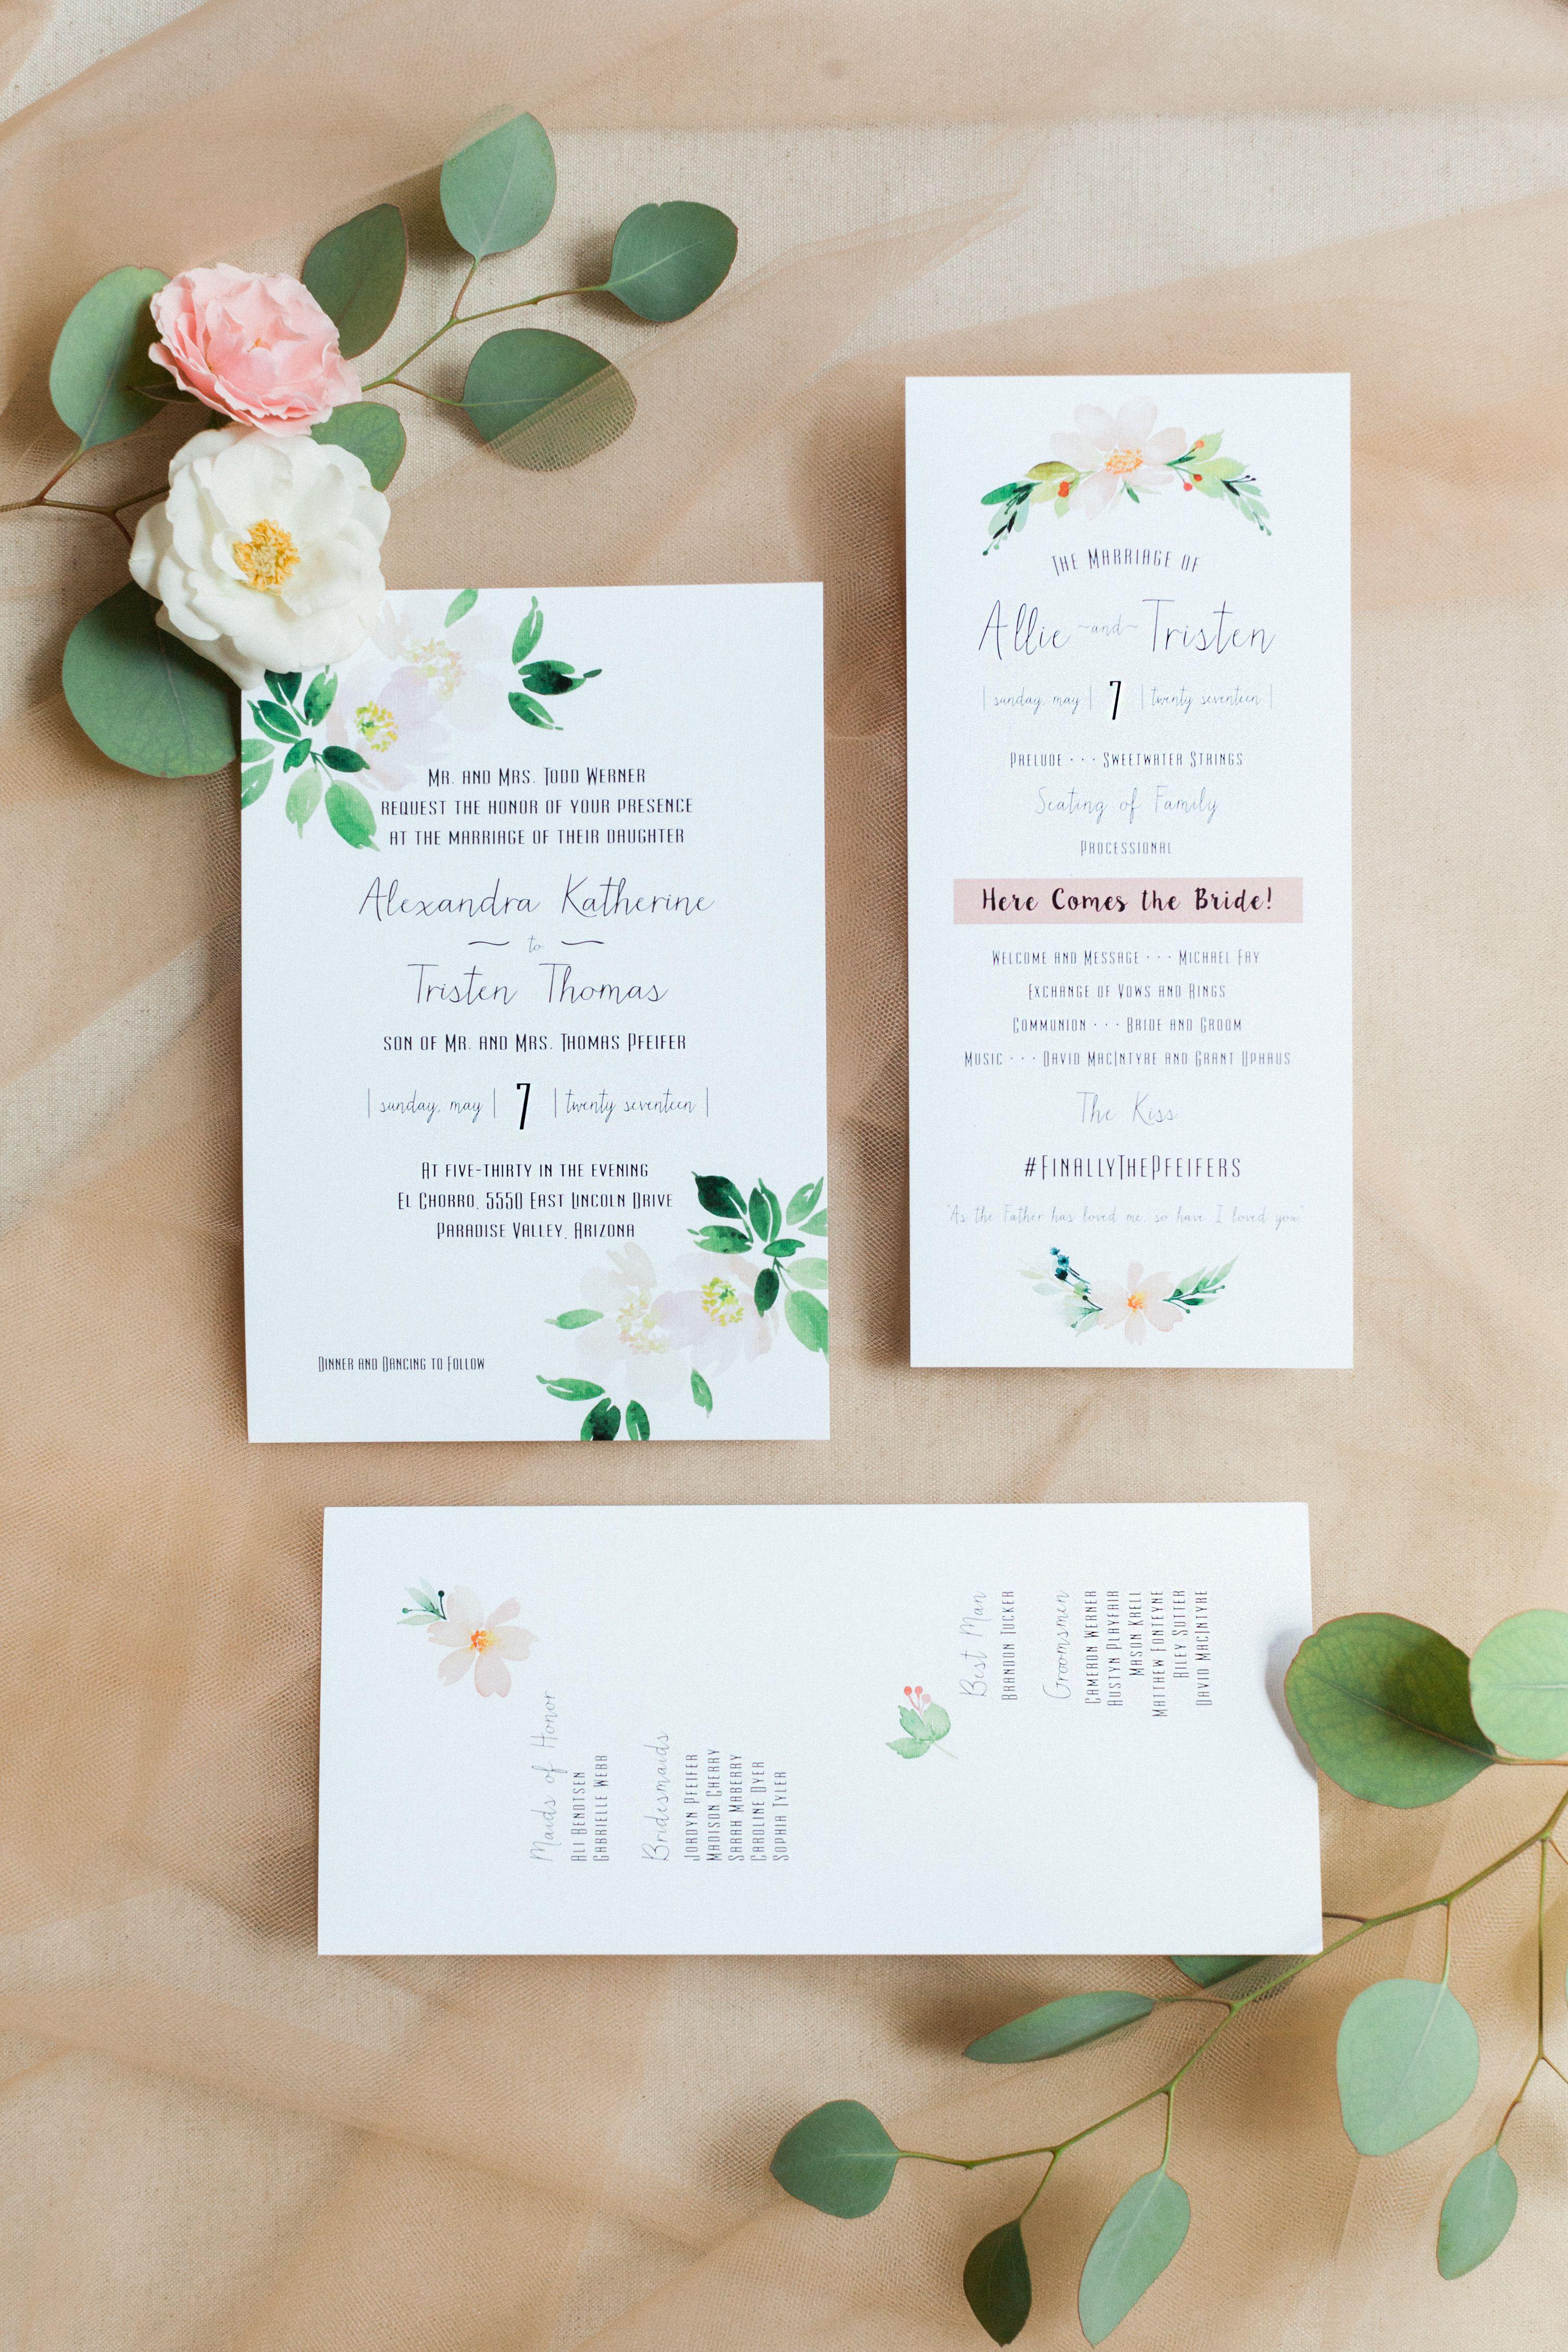 Revel wedding co pinkerton photography wedding invitations